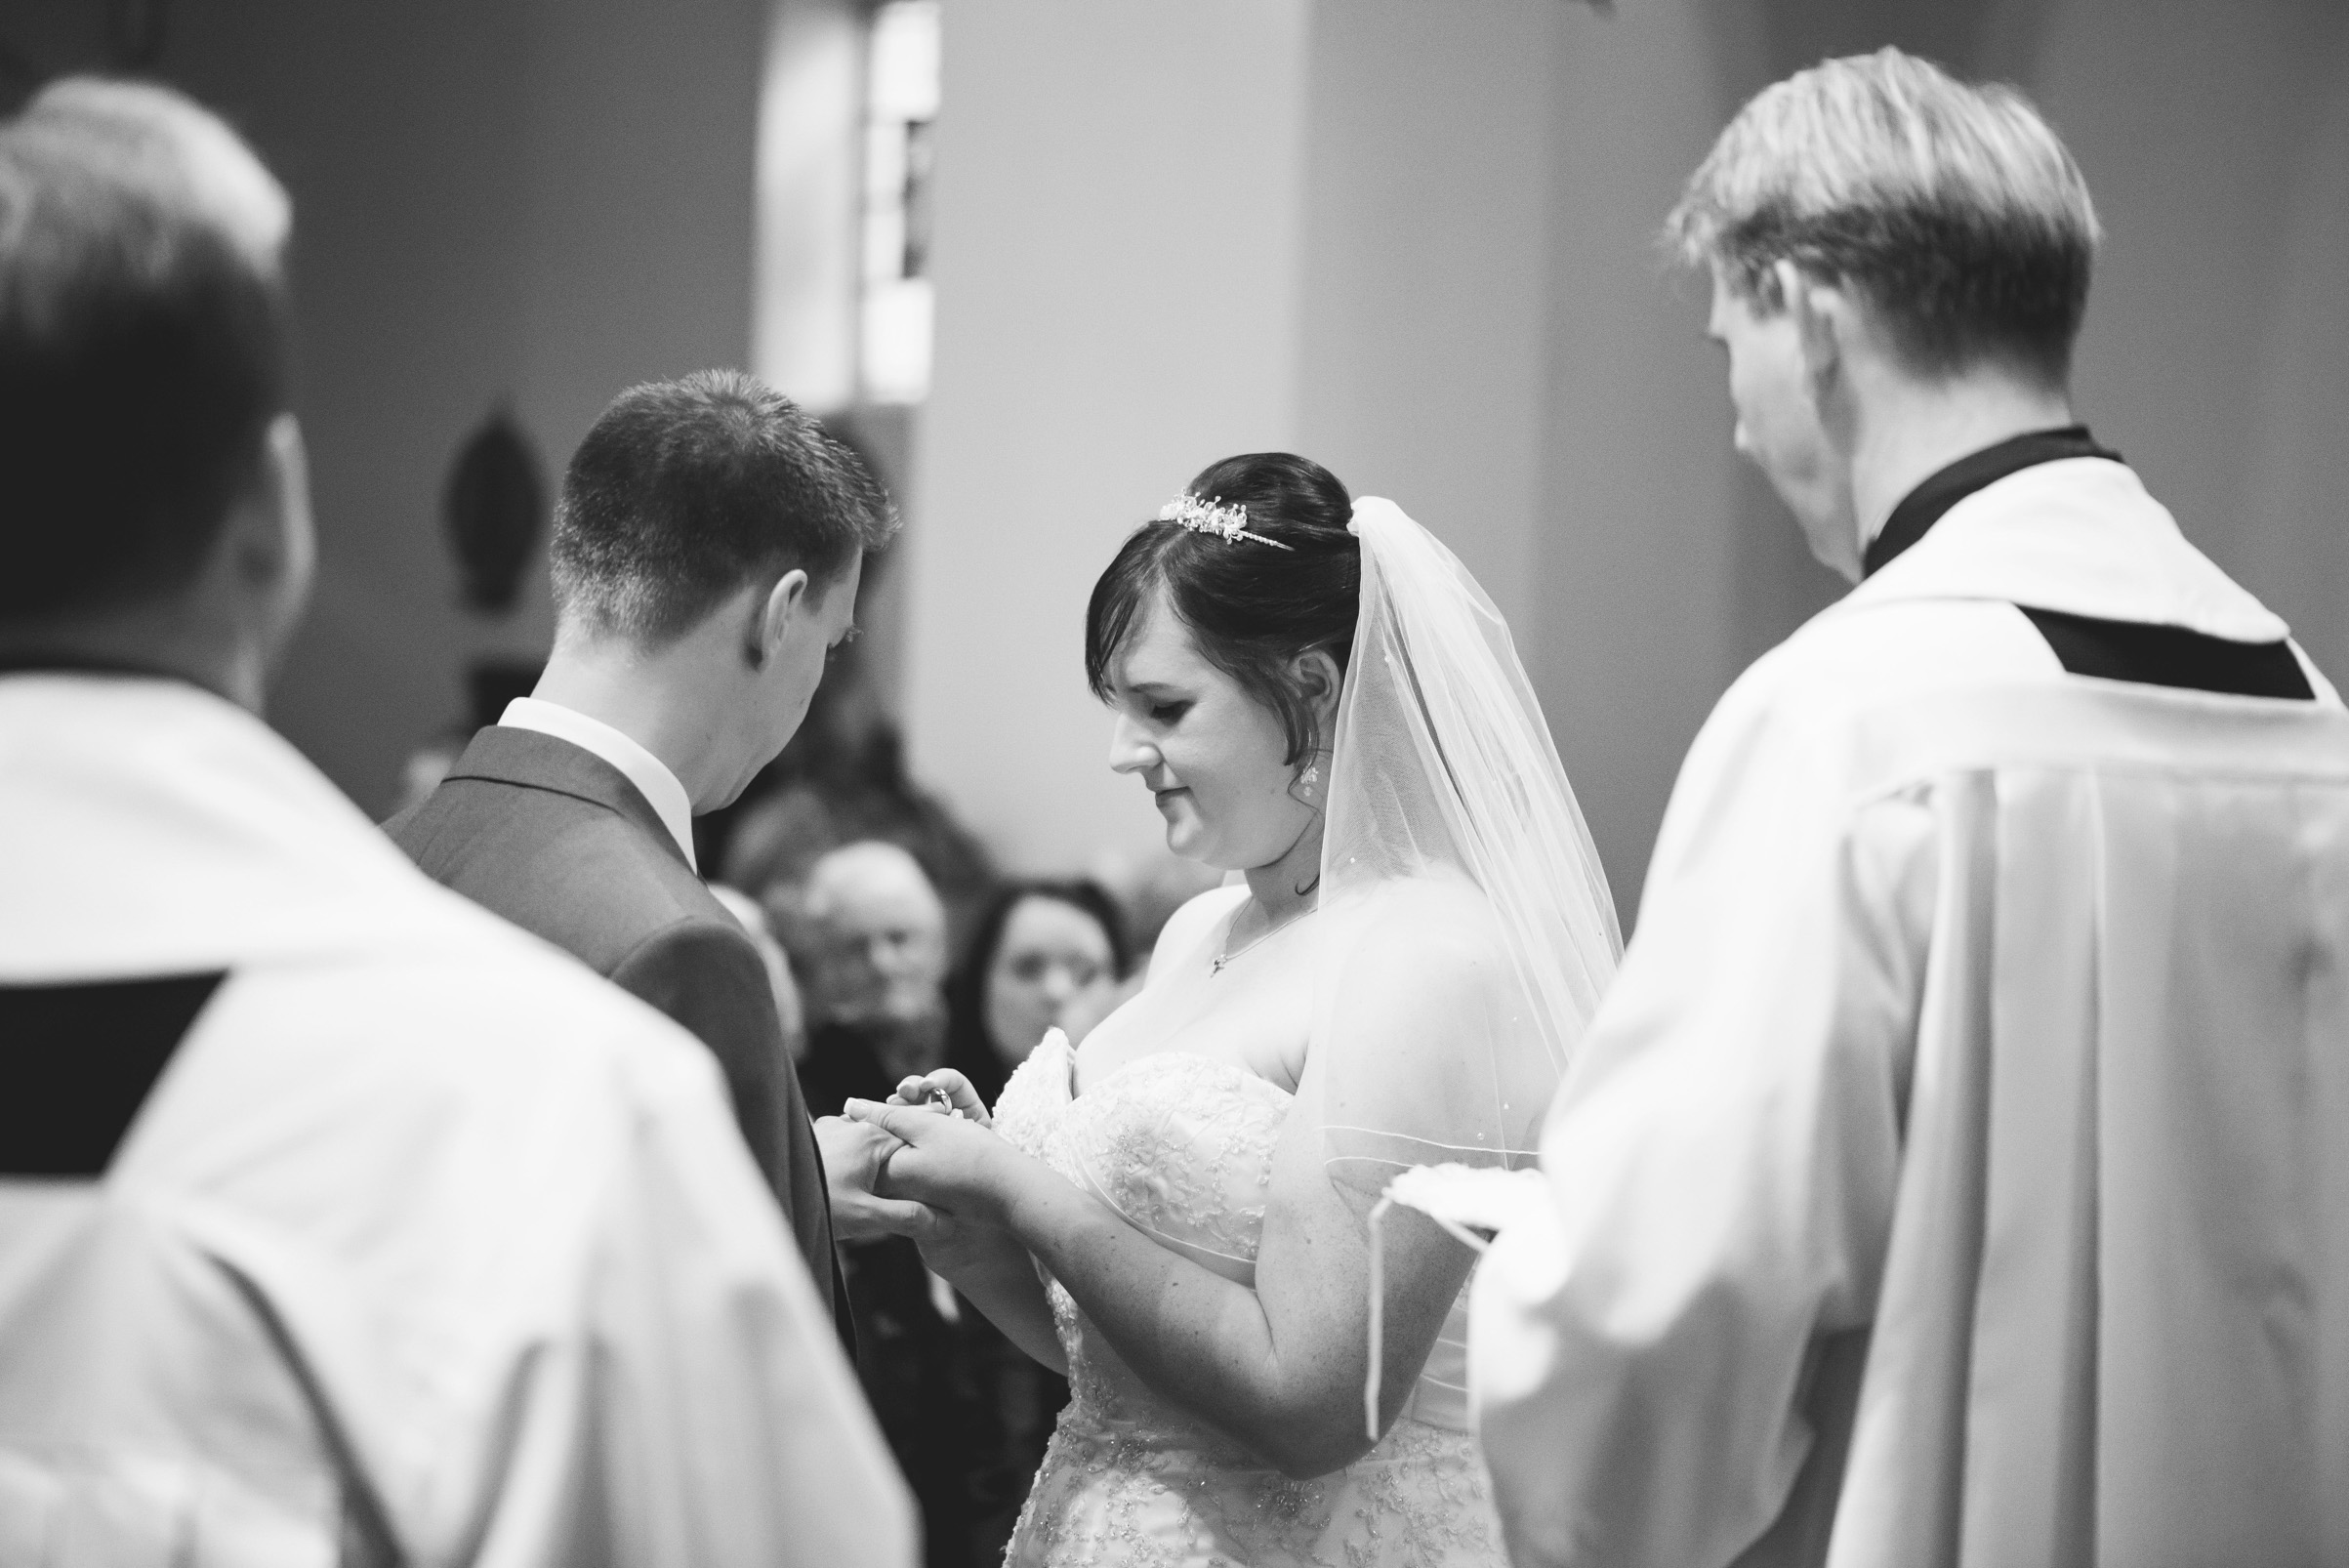 The+Fairlawns+wedding+Aldridge+StLukes+Church-94.jpg